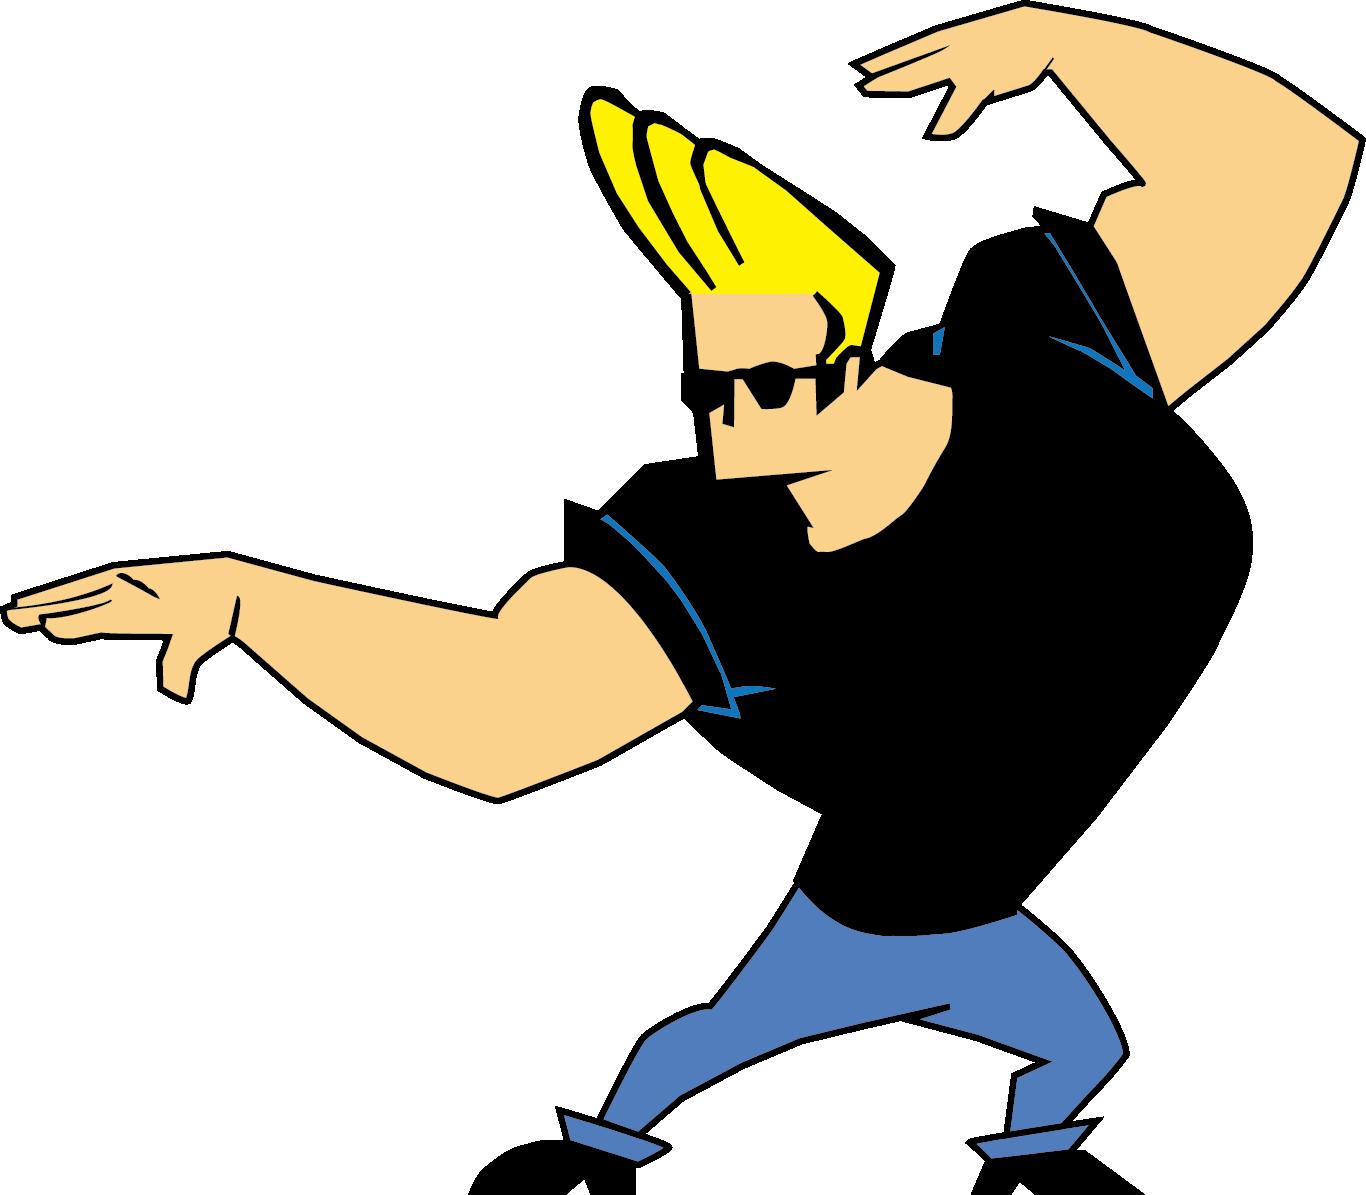 Jhonny Bravo By Me Johnny Bravo Johny Bravo Favorite Cartoon Character